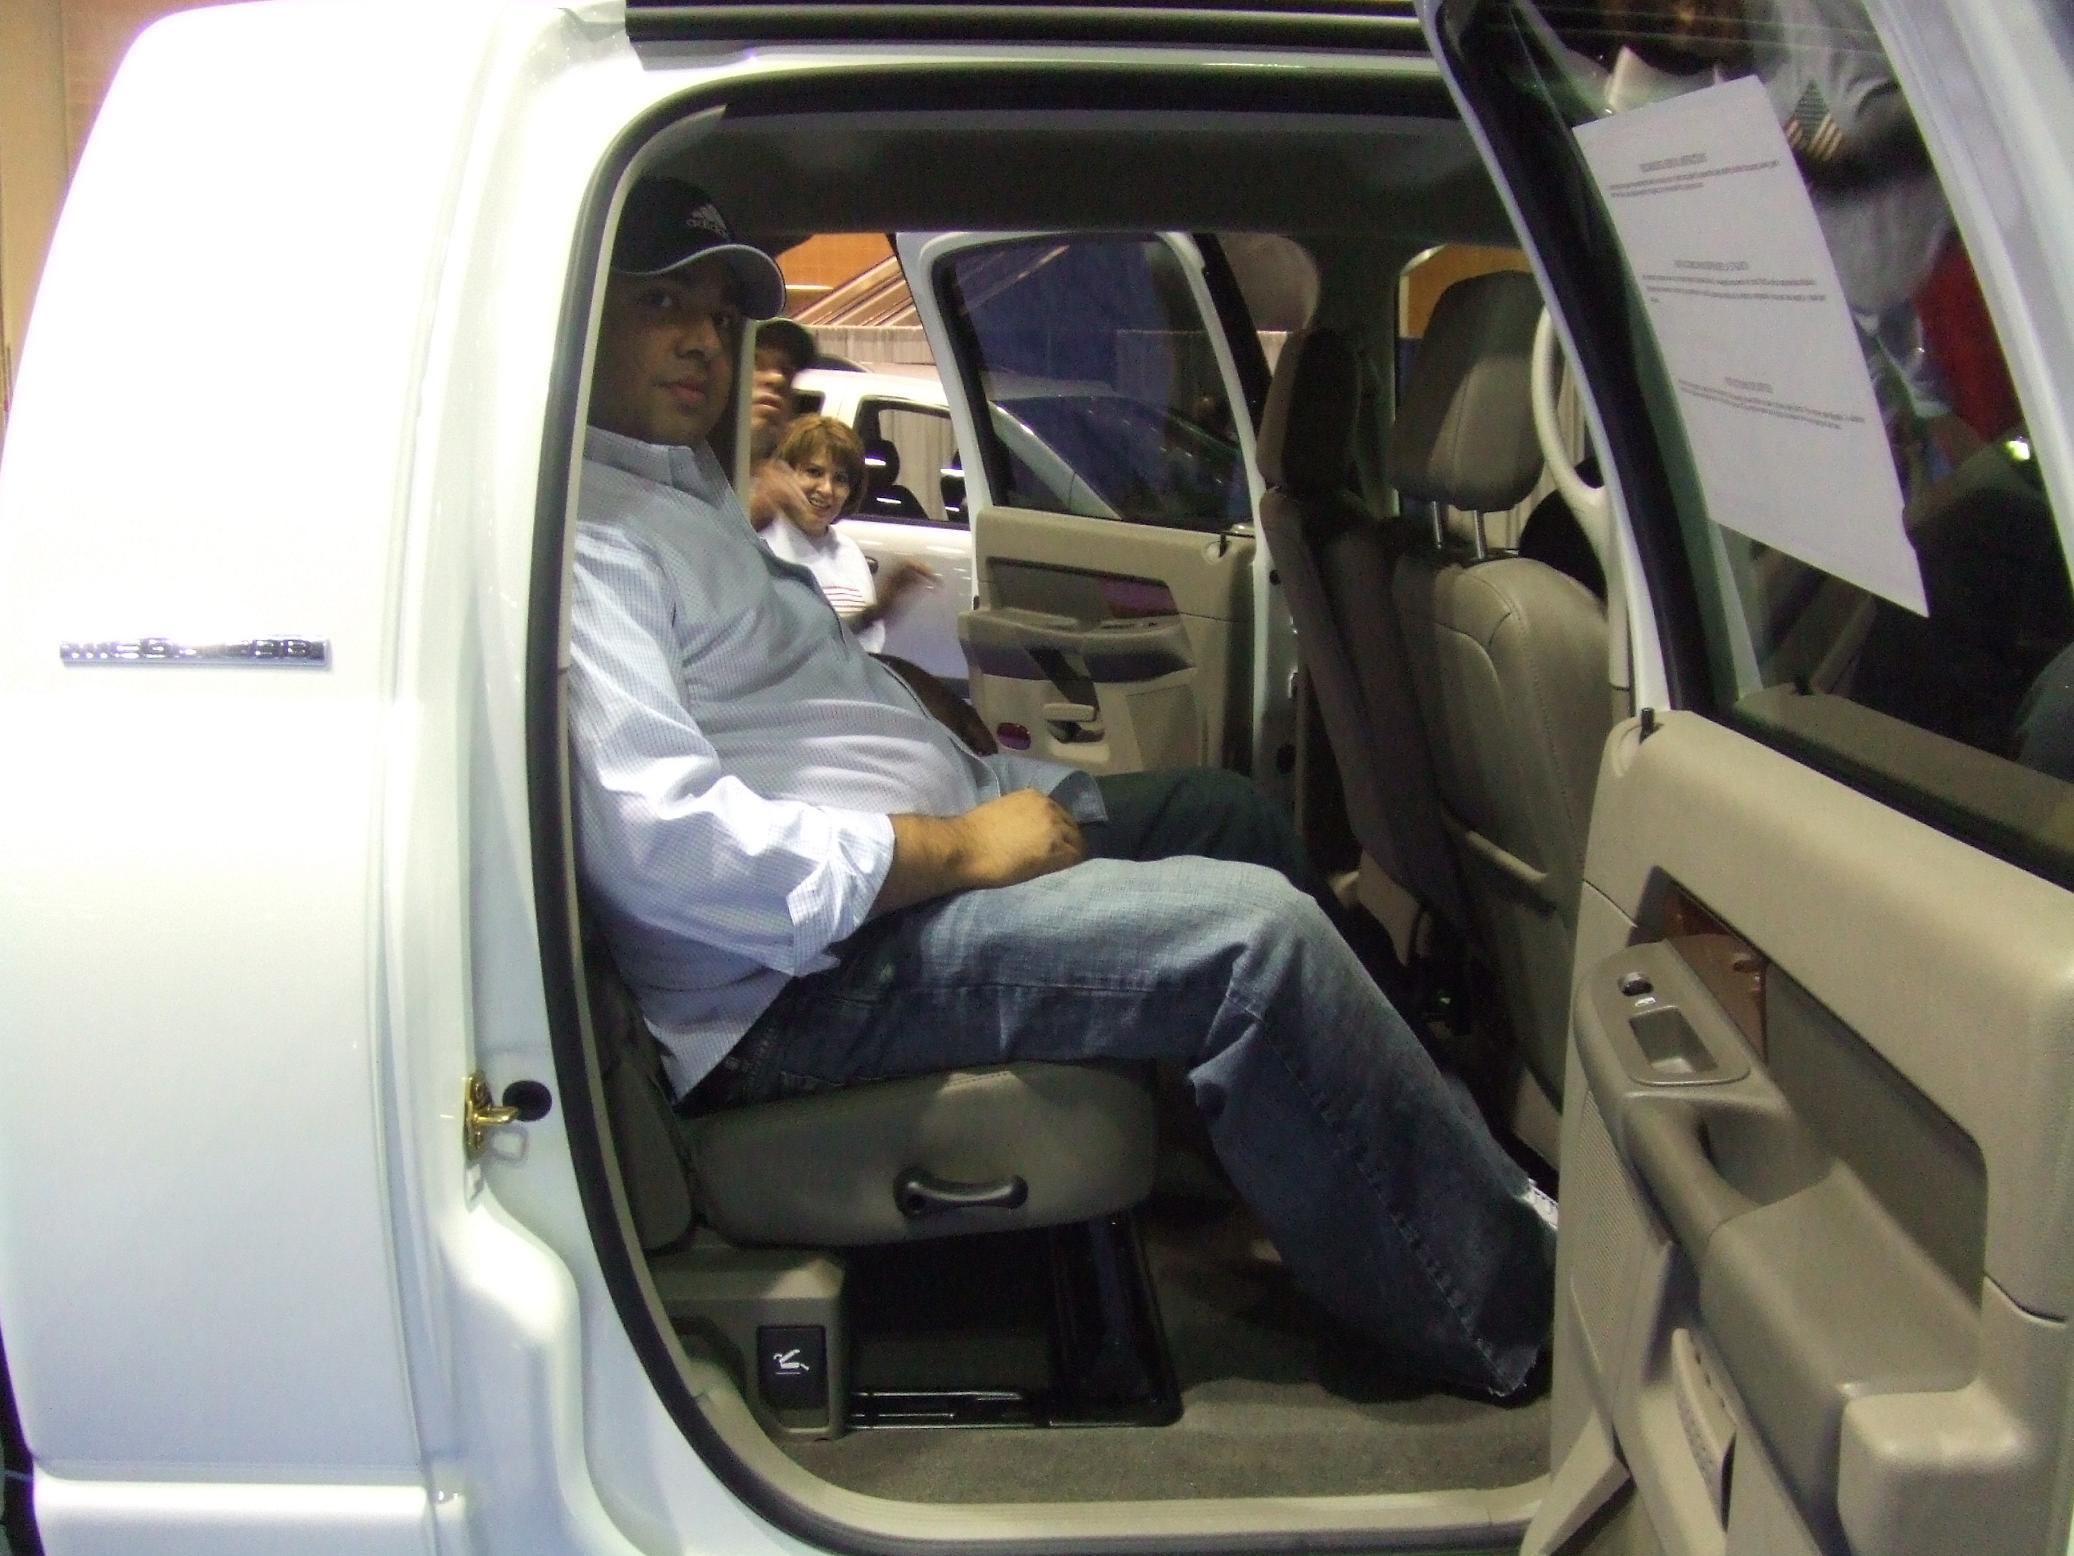 D Dodge Ram Mega Cab Edit on 2005 Dodge Ram